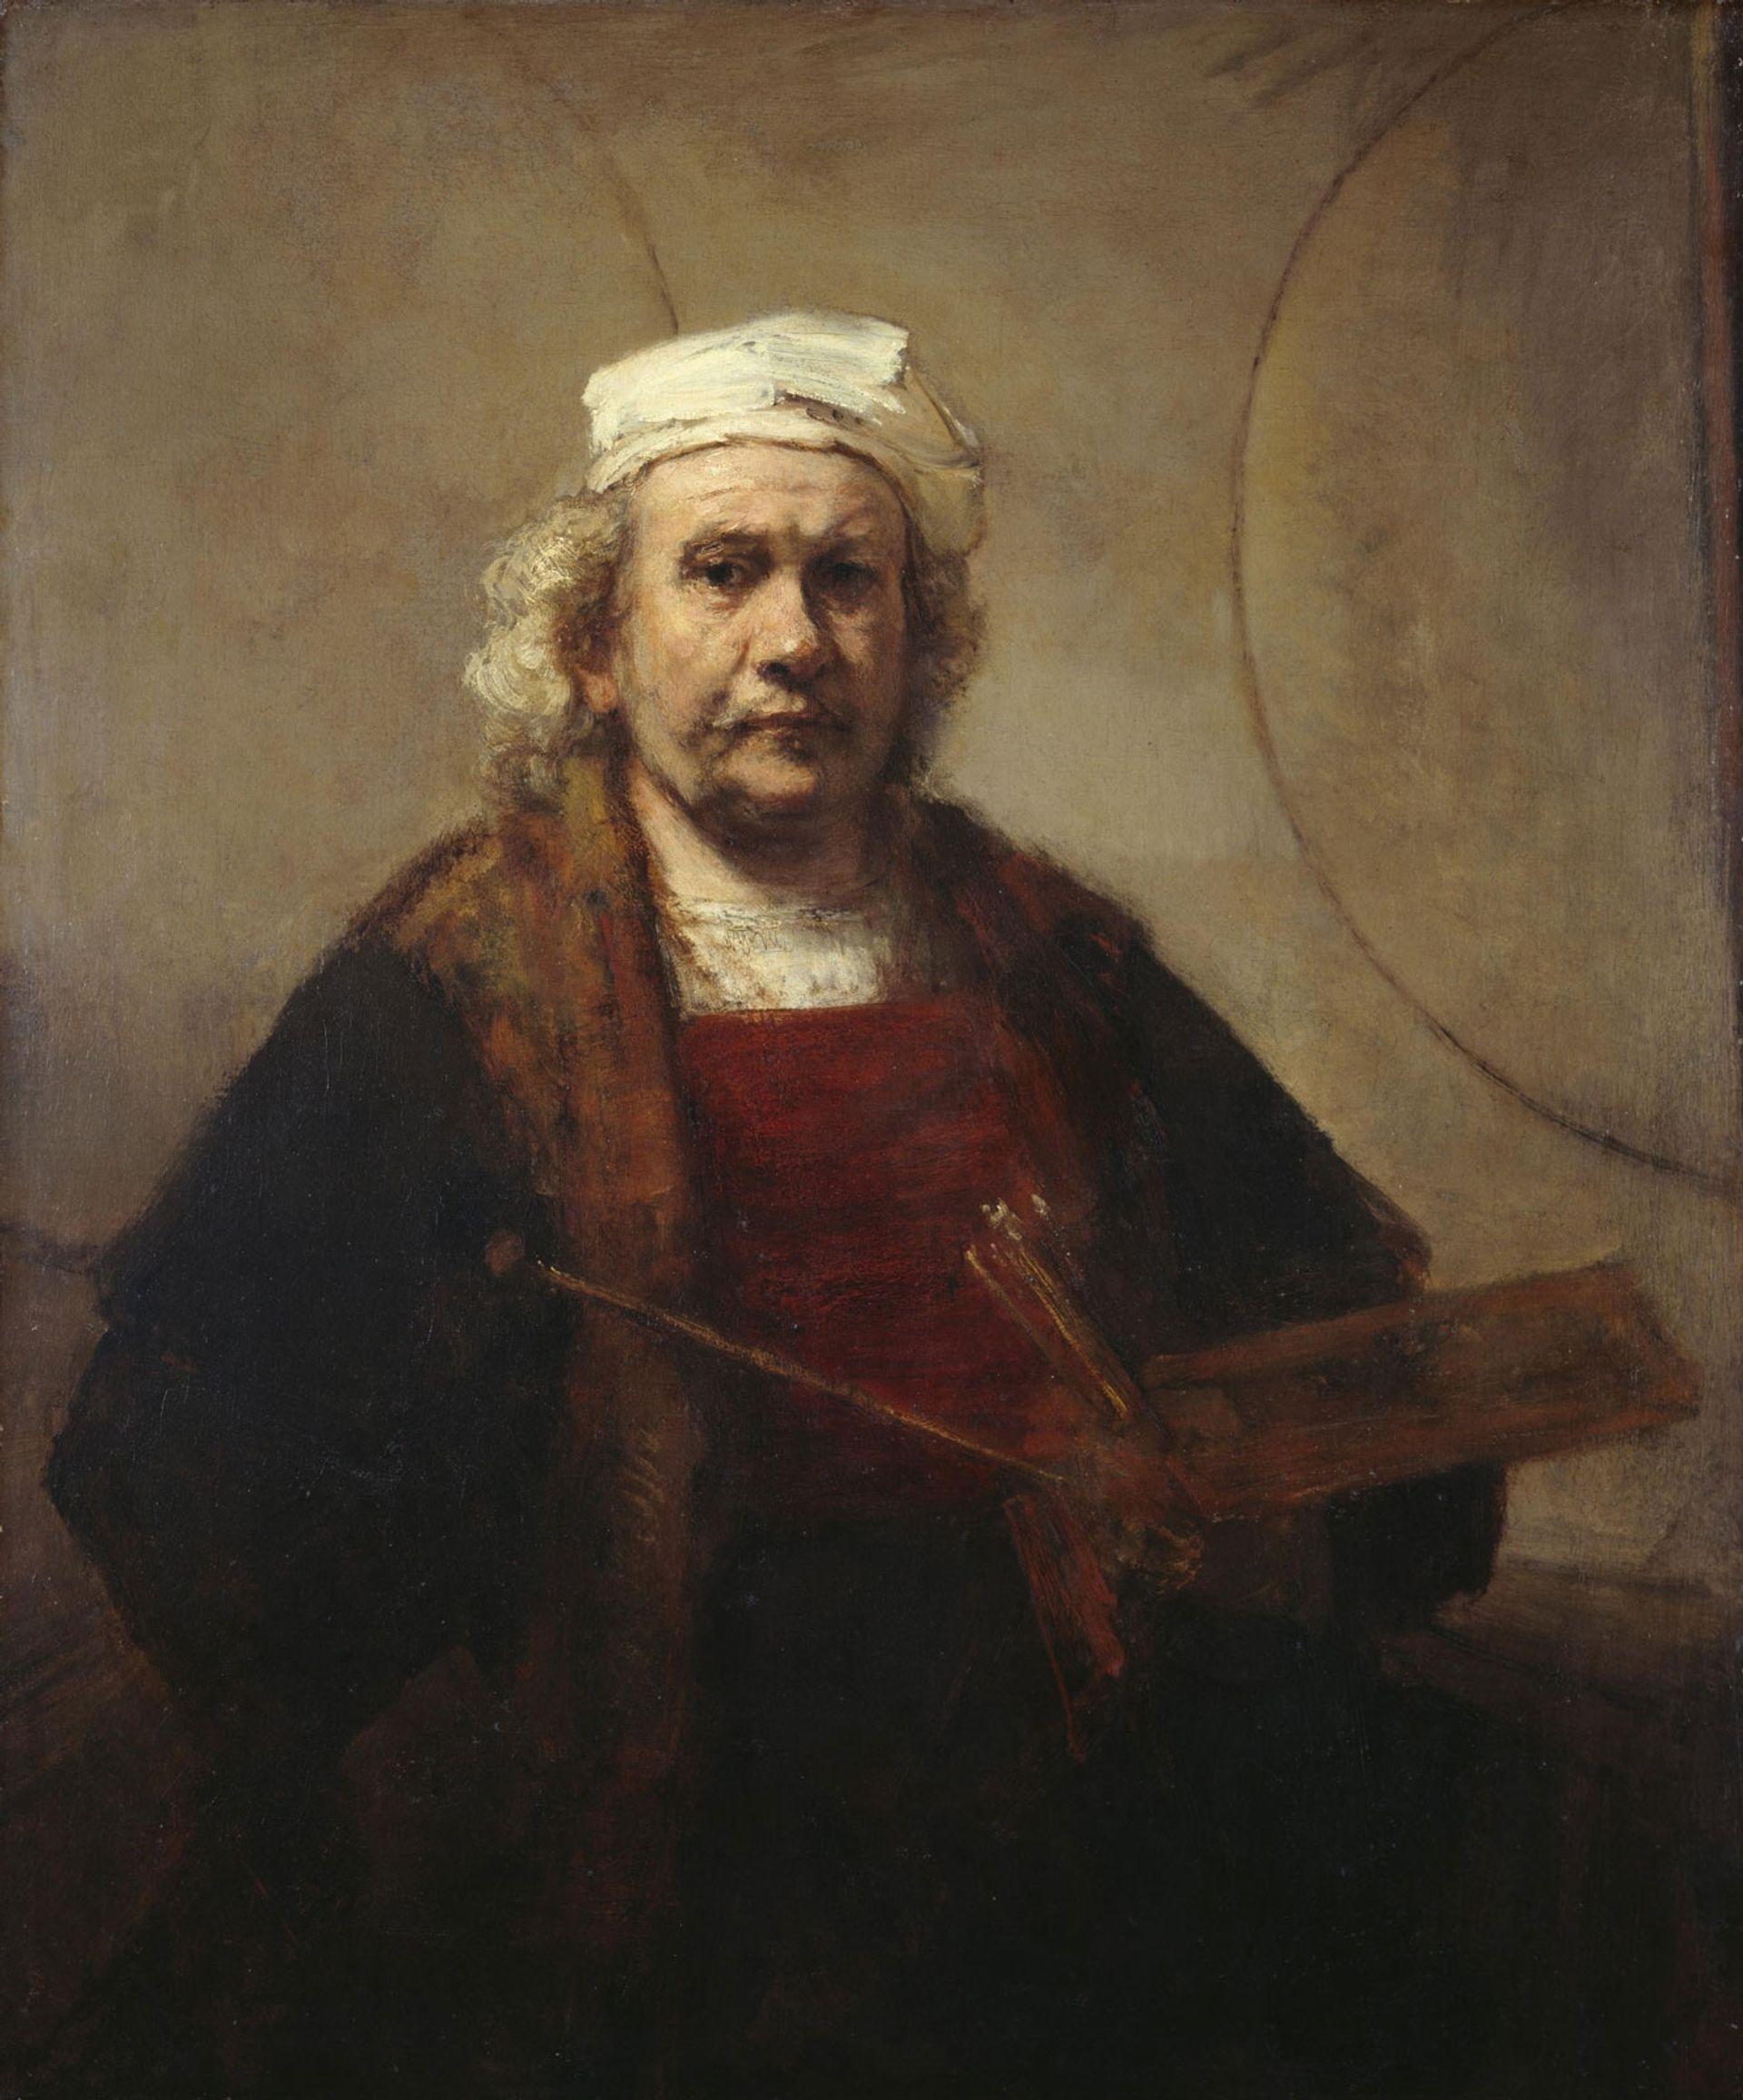 Rembrandt van Rijn, Self-Portrait with Two Circles (around 1665) Photo: © Historic England Photo Library